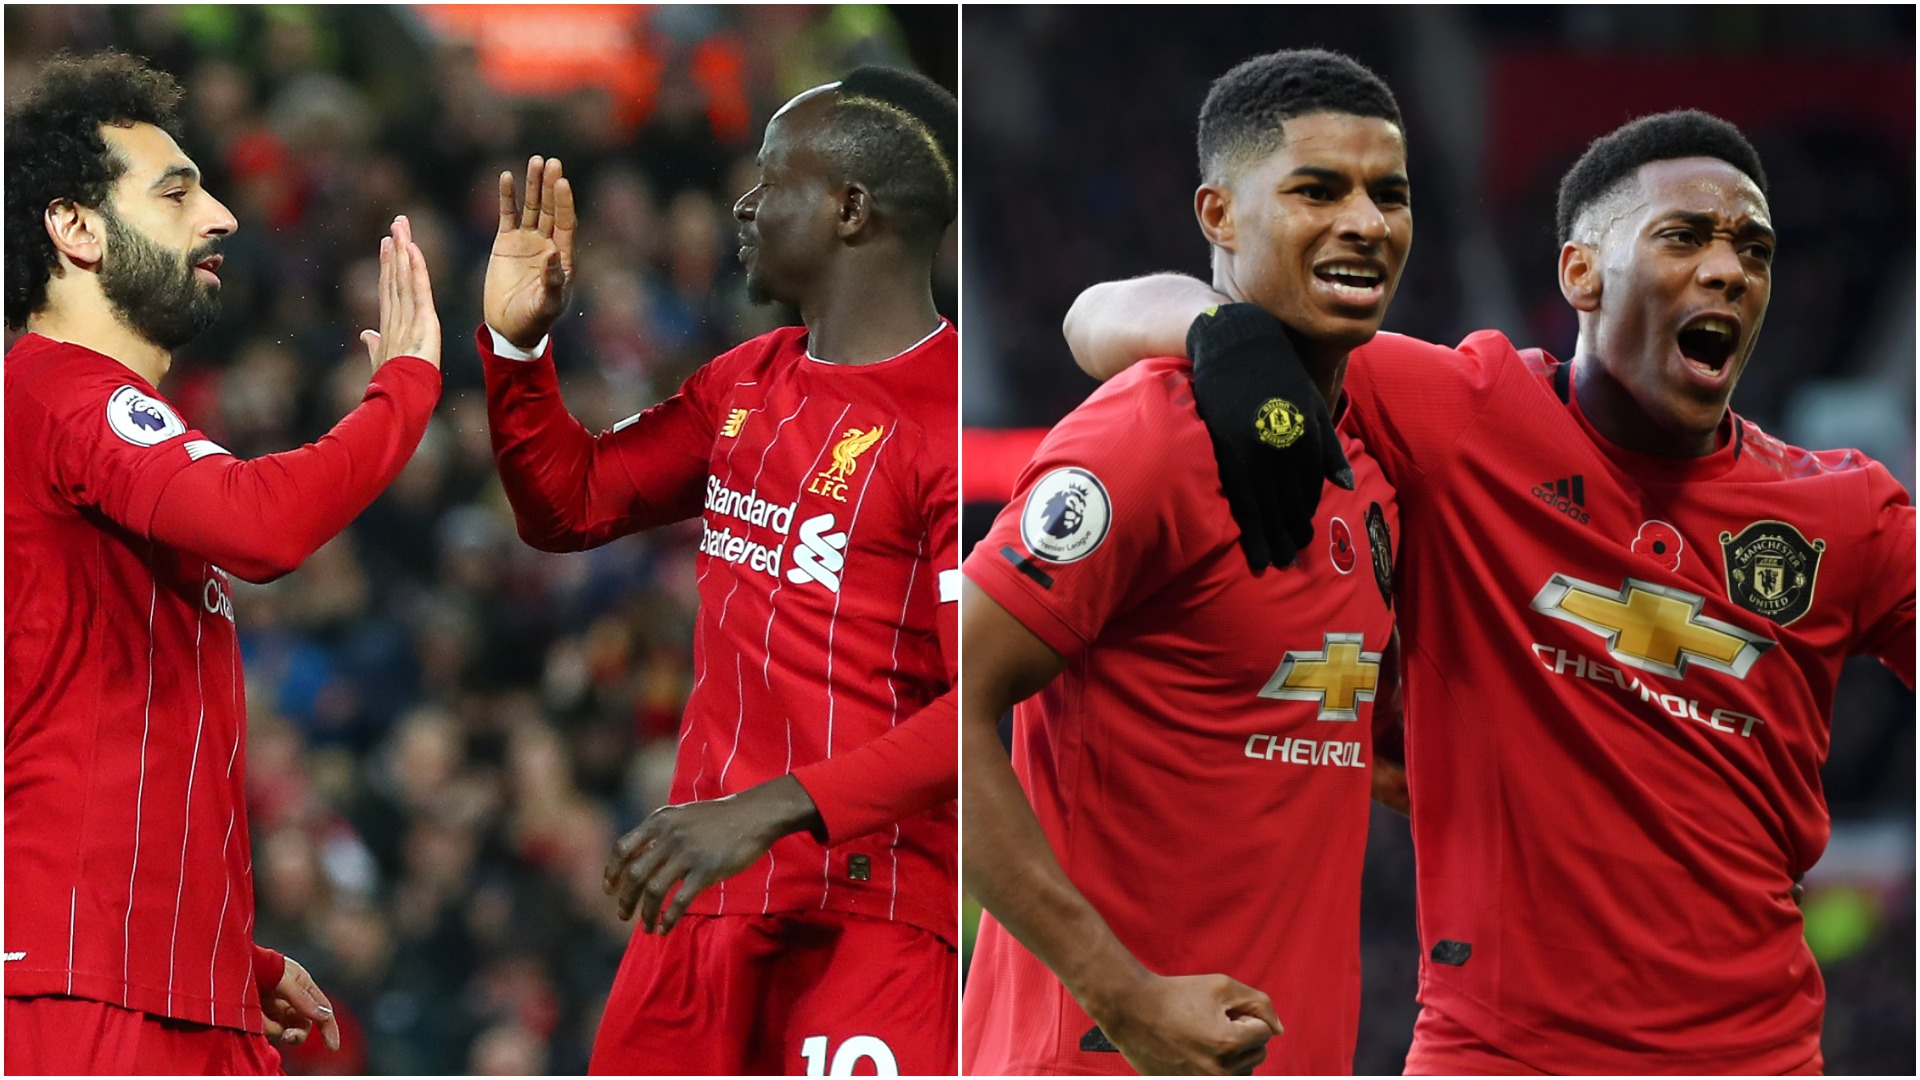 Liverpool V Man Utd How Rashford & Martial Pare To Salah